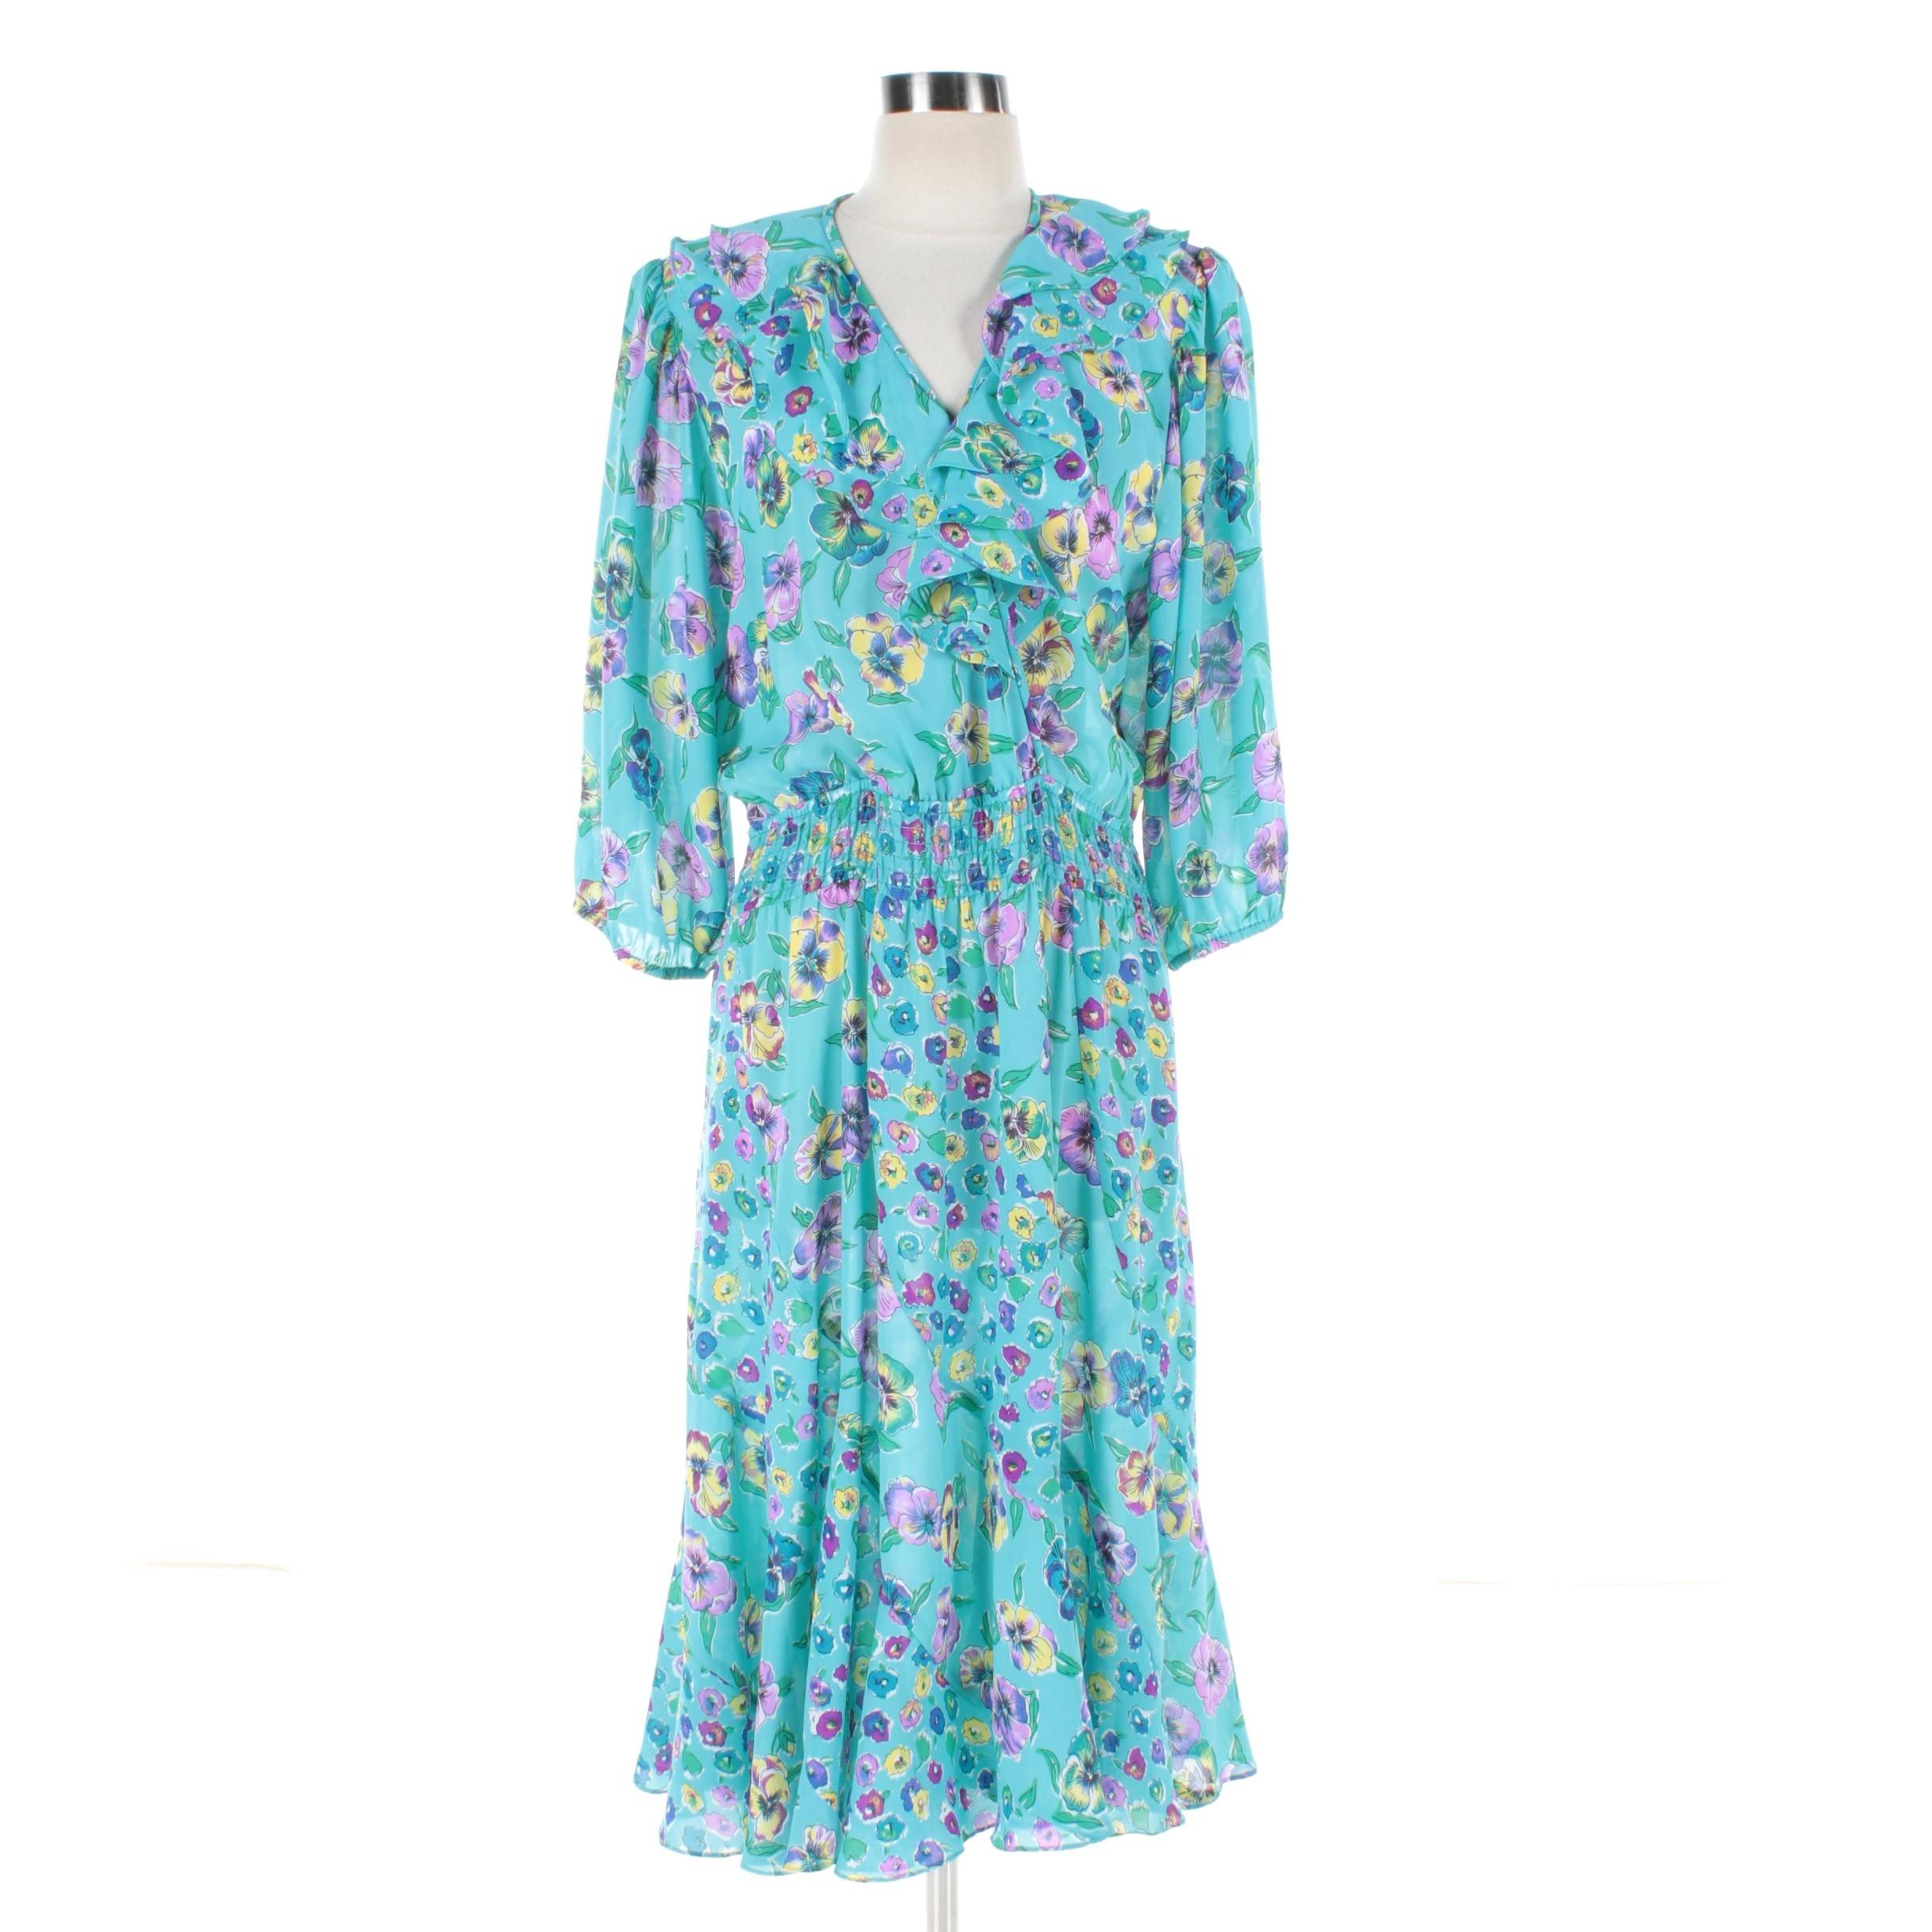 Women's Susan Frai Floral Dress